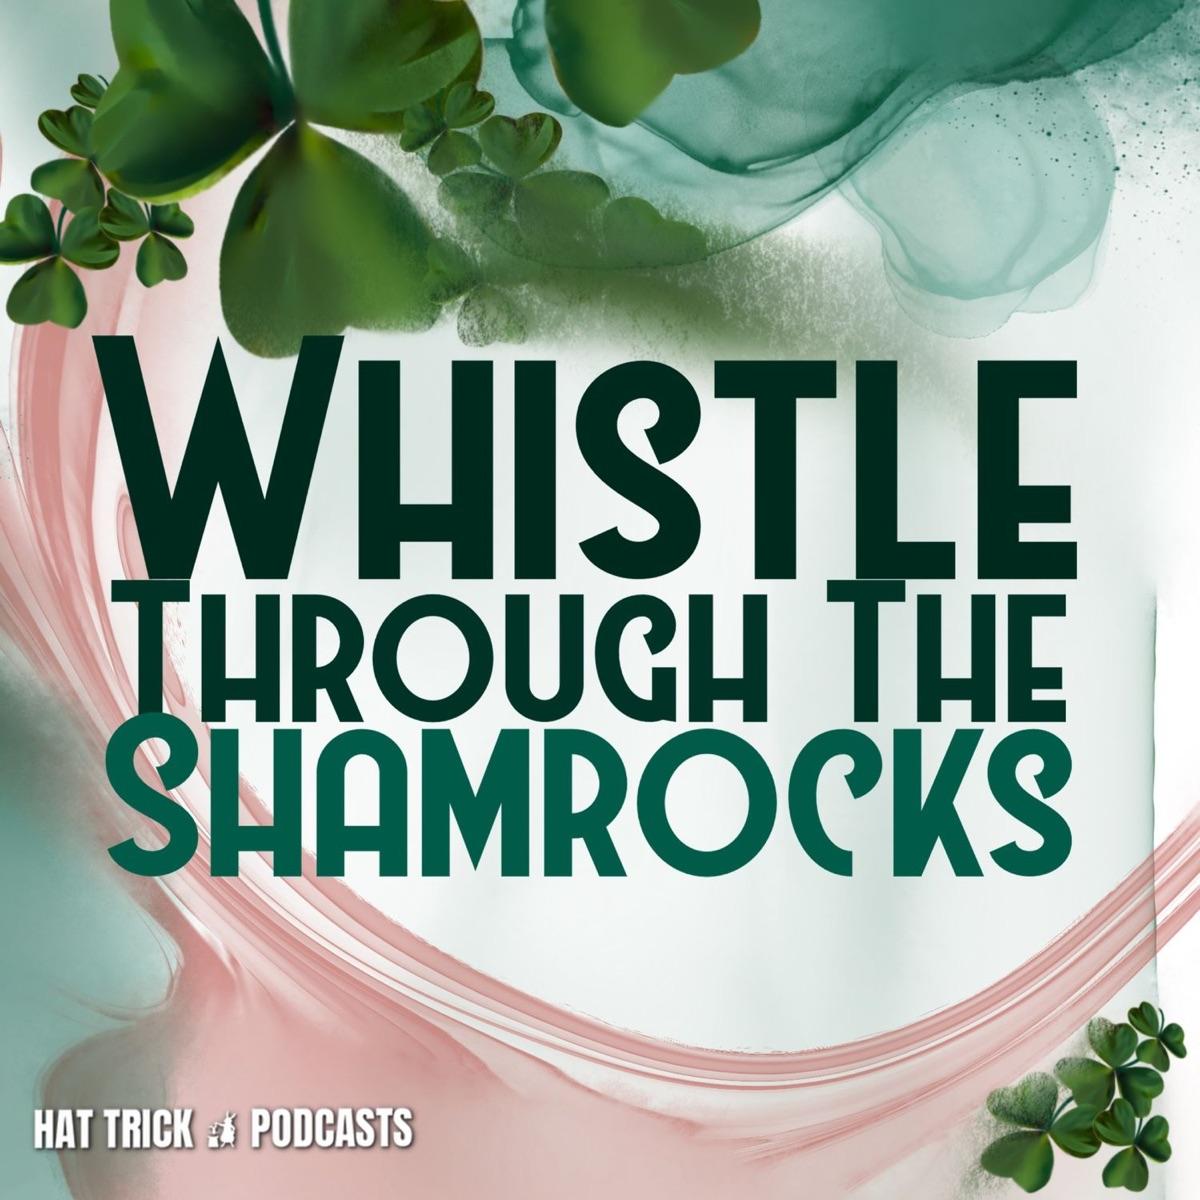 Whistle Through The Shamrocks